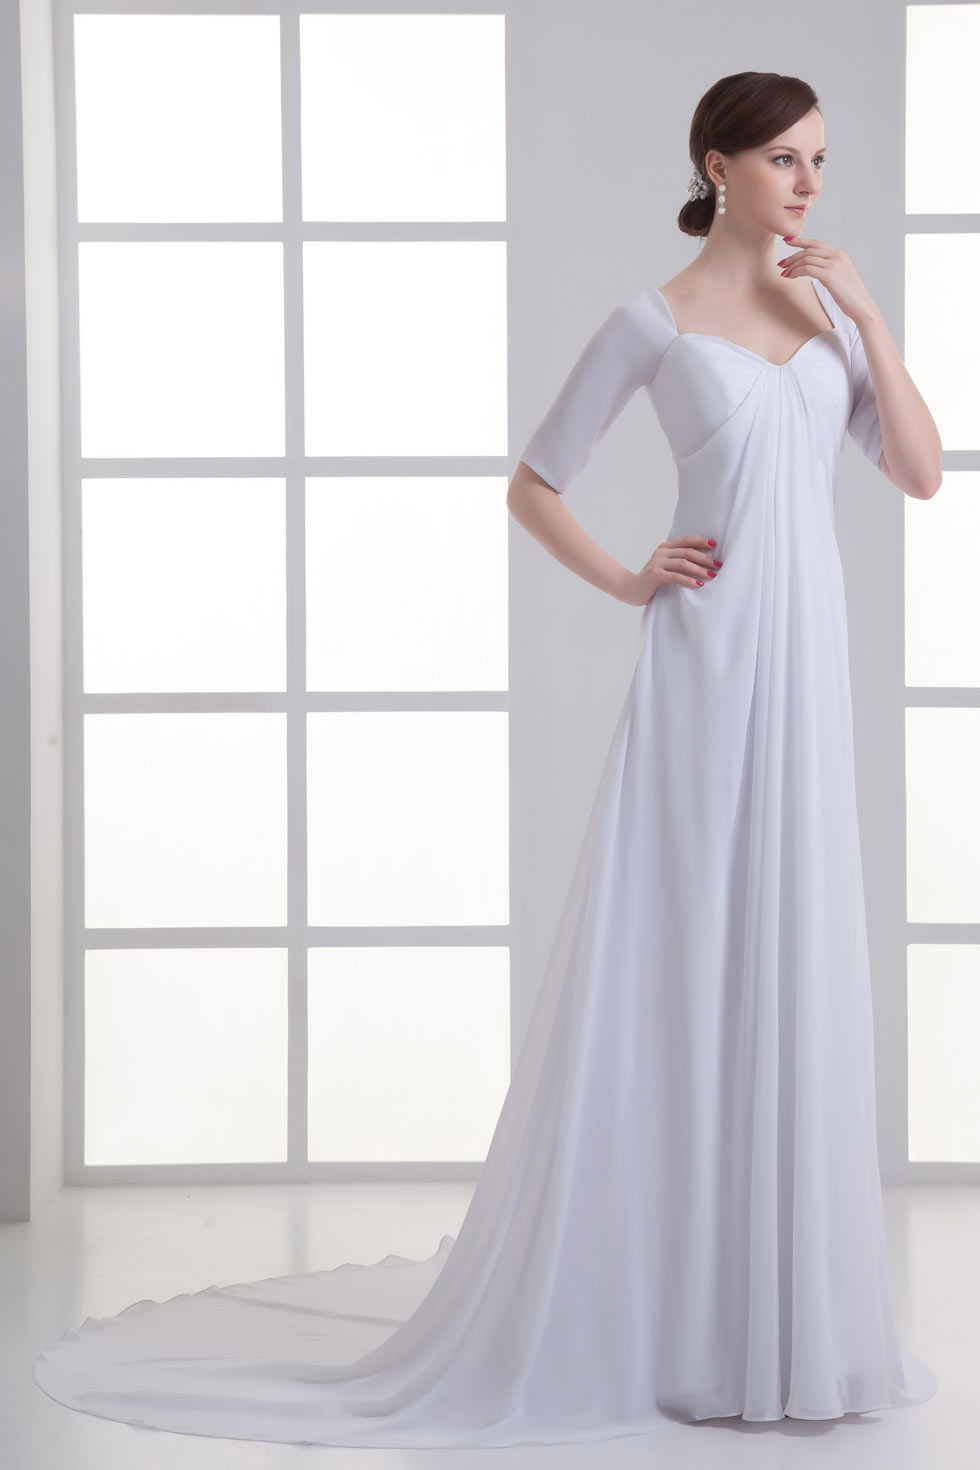 ... Robe de mariée 2015 Robe de mariée empire simple à manche mi-longue